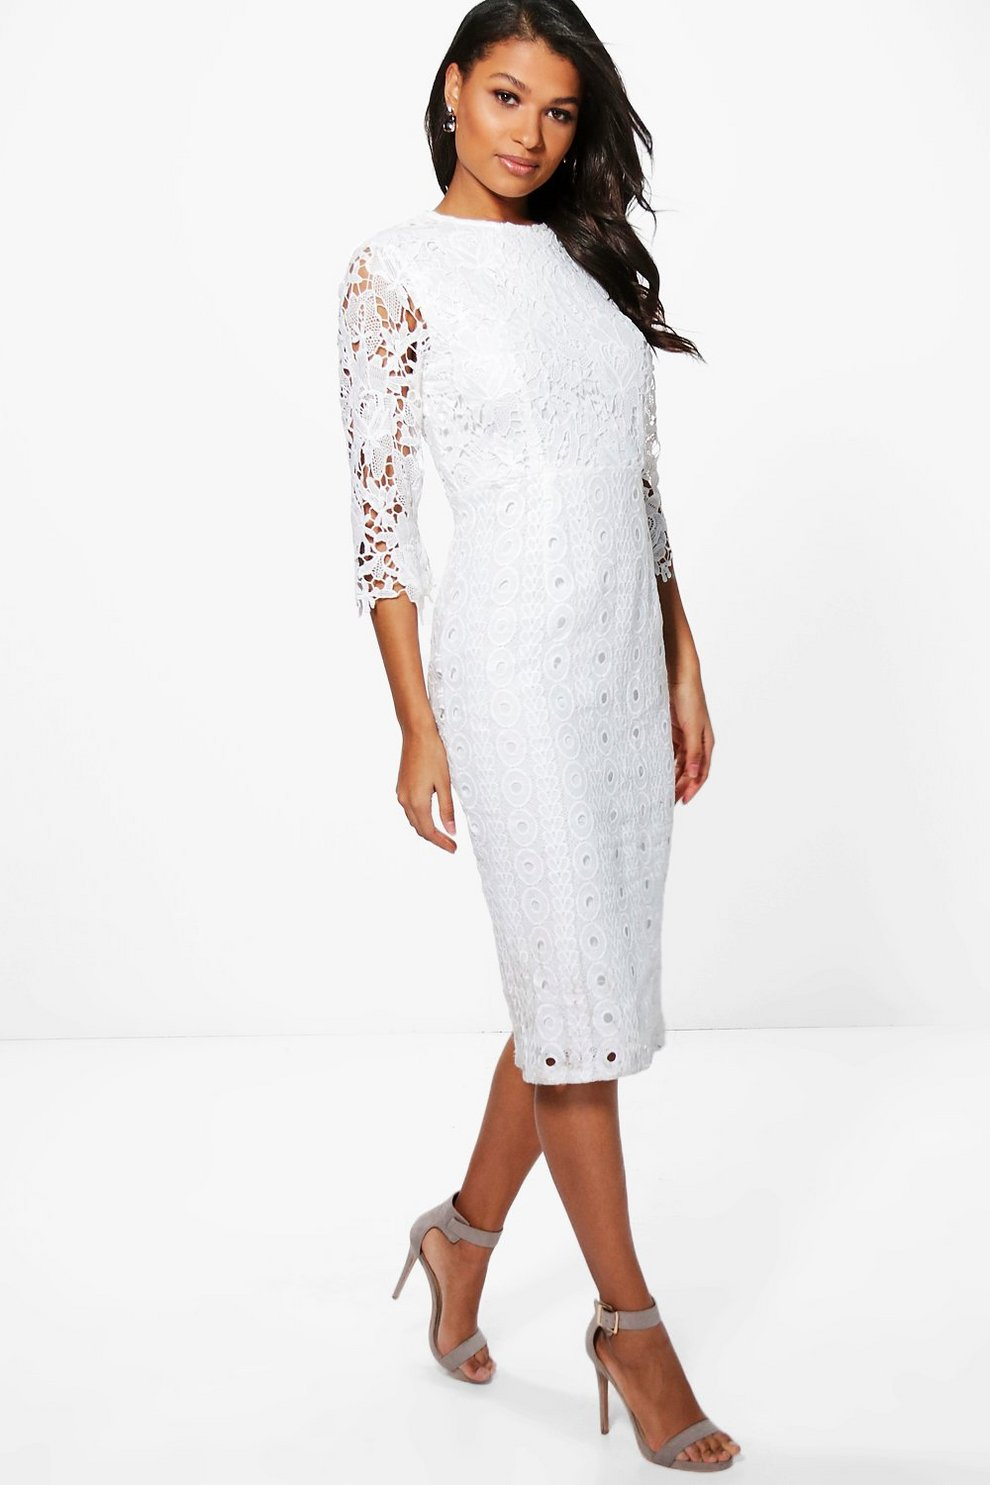 Boutique Kiki Lace 3 4 Sleeve Midi Dress  a6076ef01